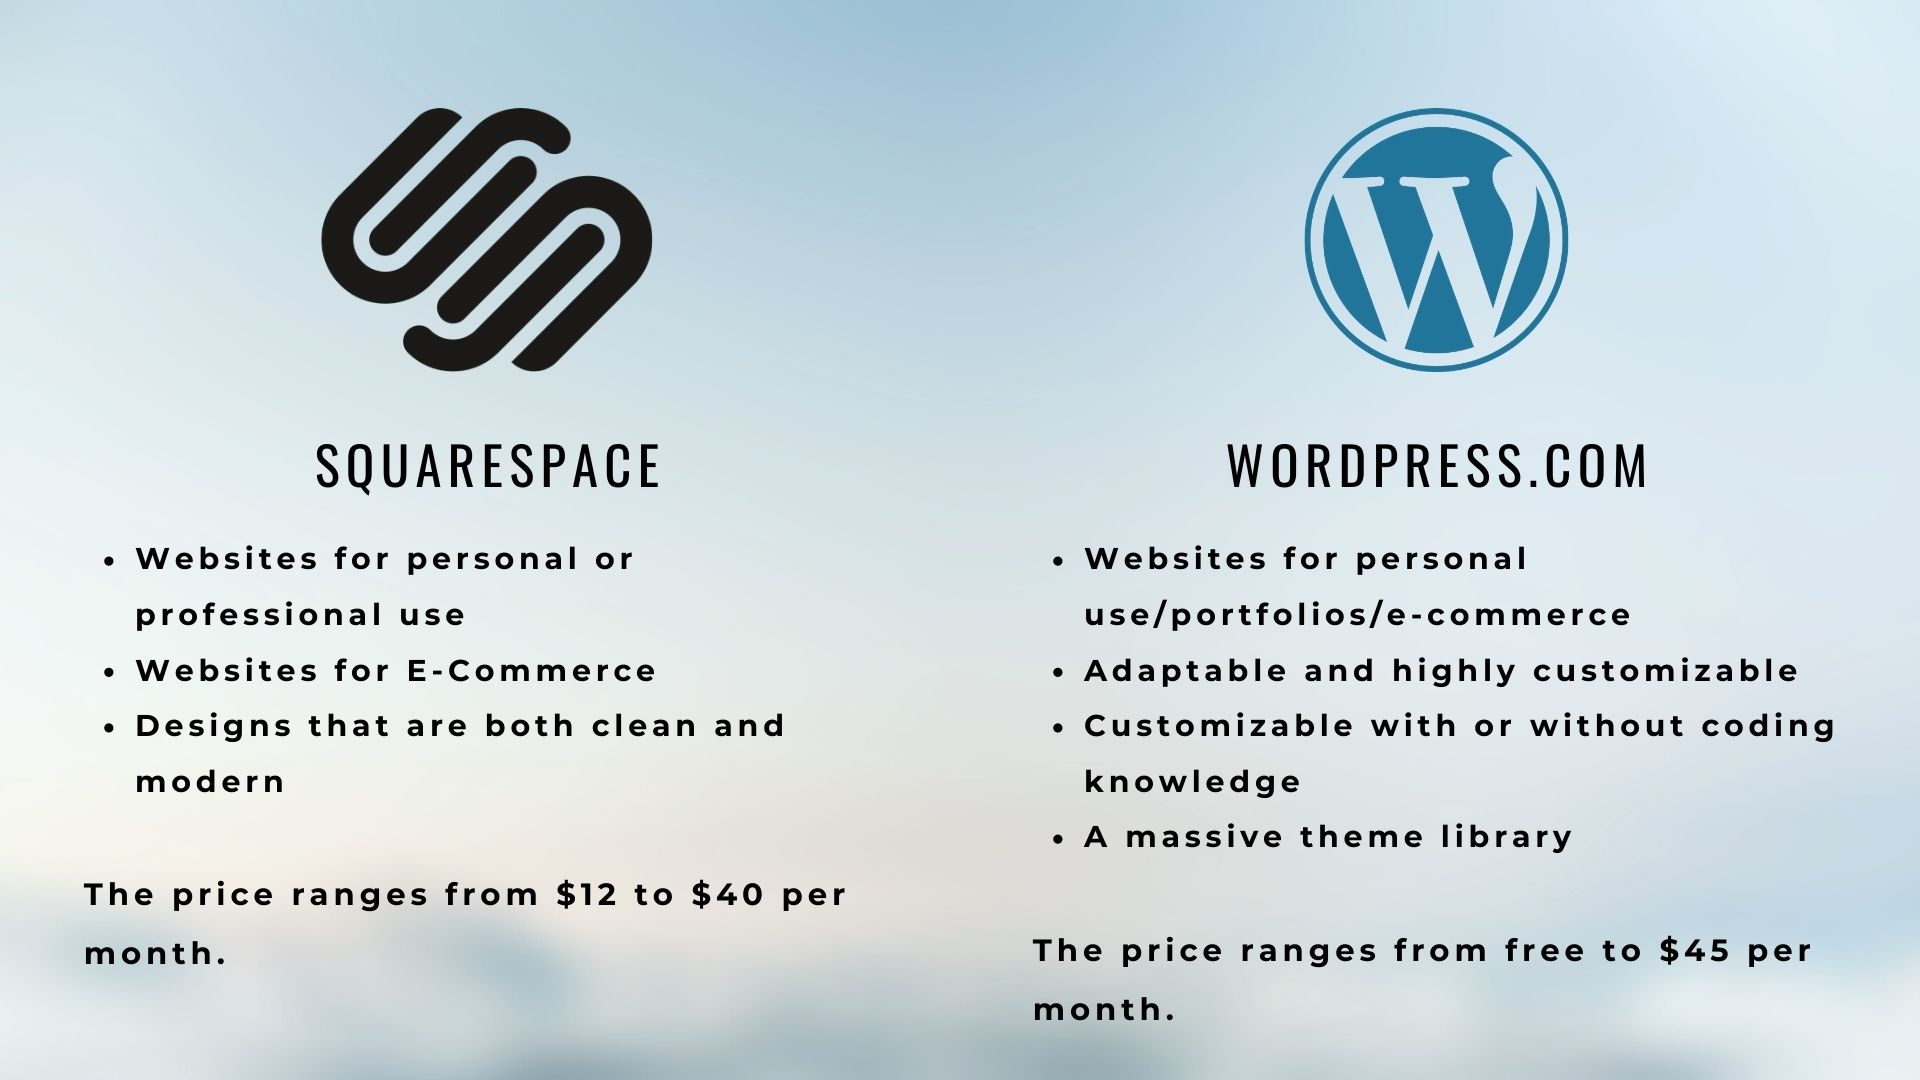 Squarespace vs WordPress.com